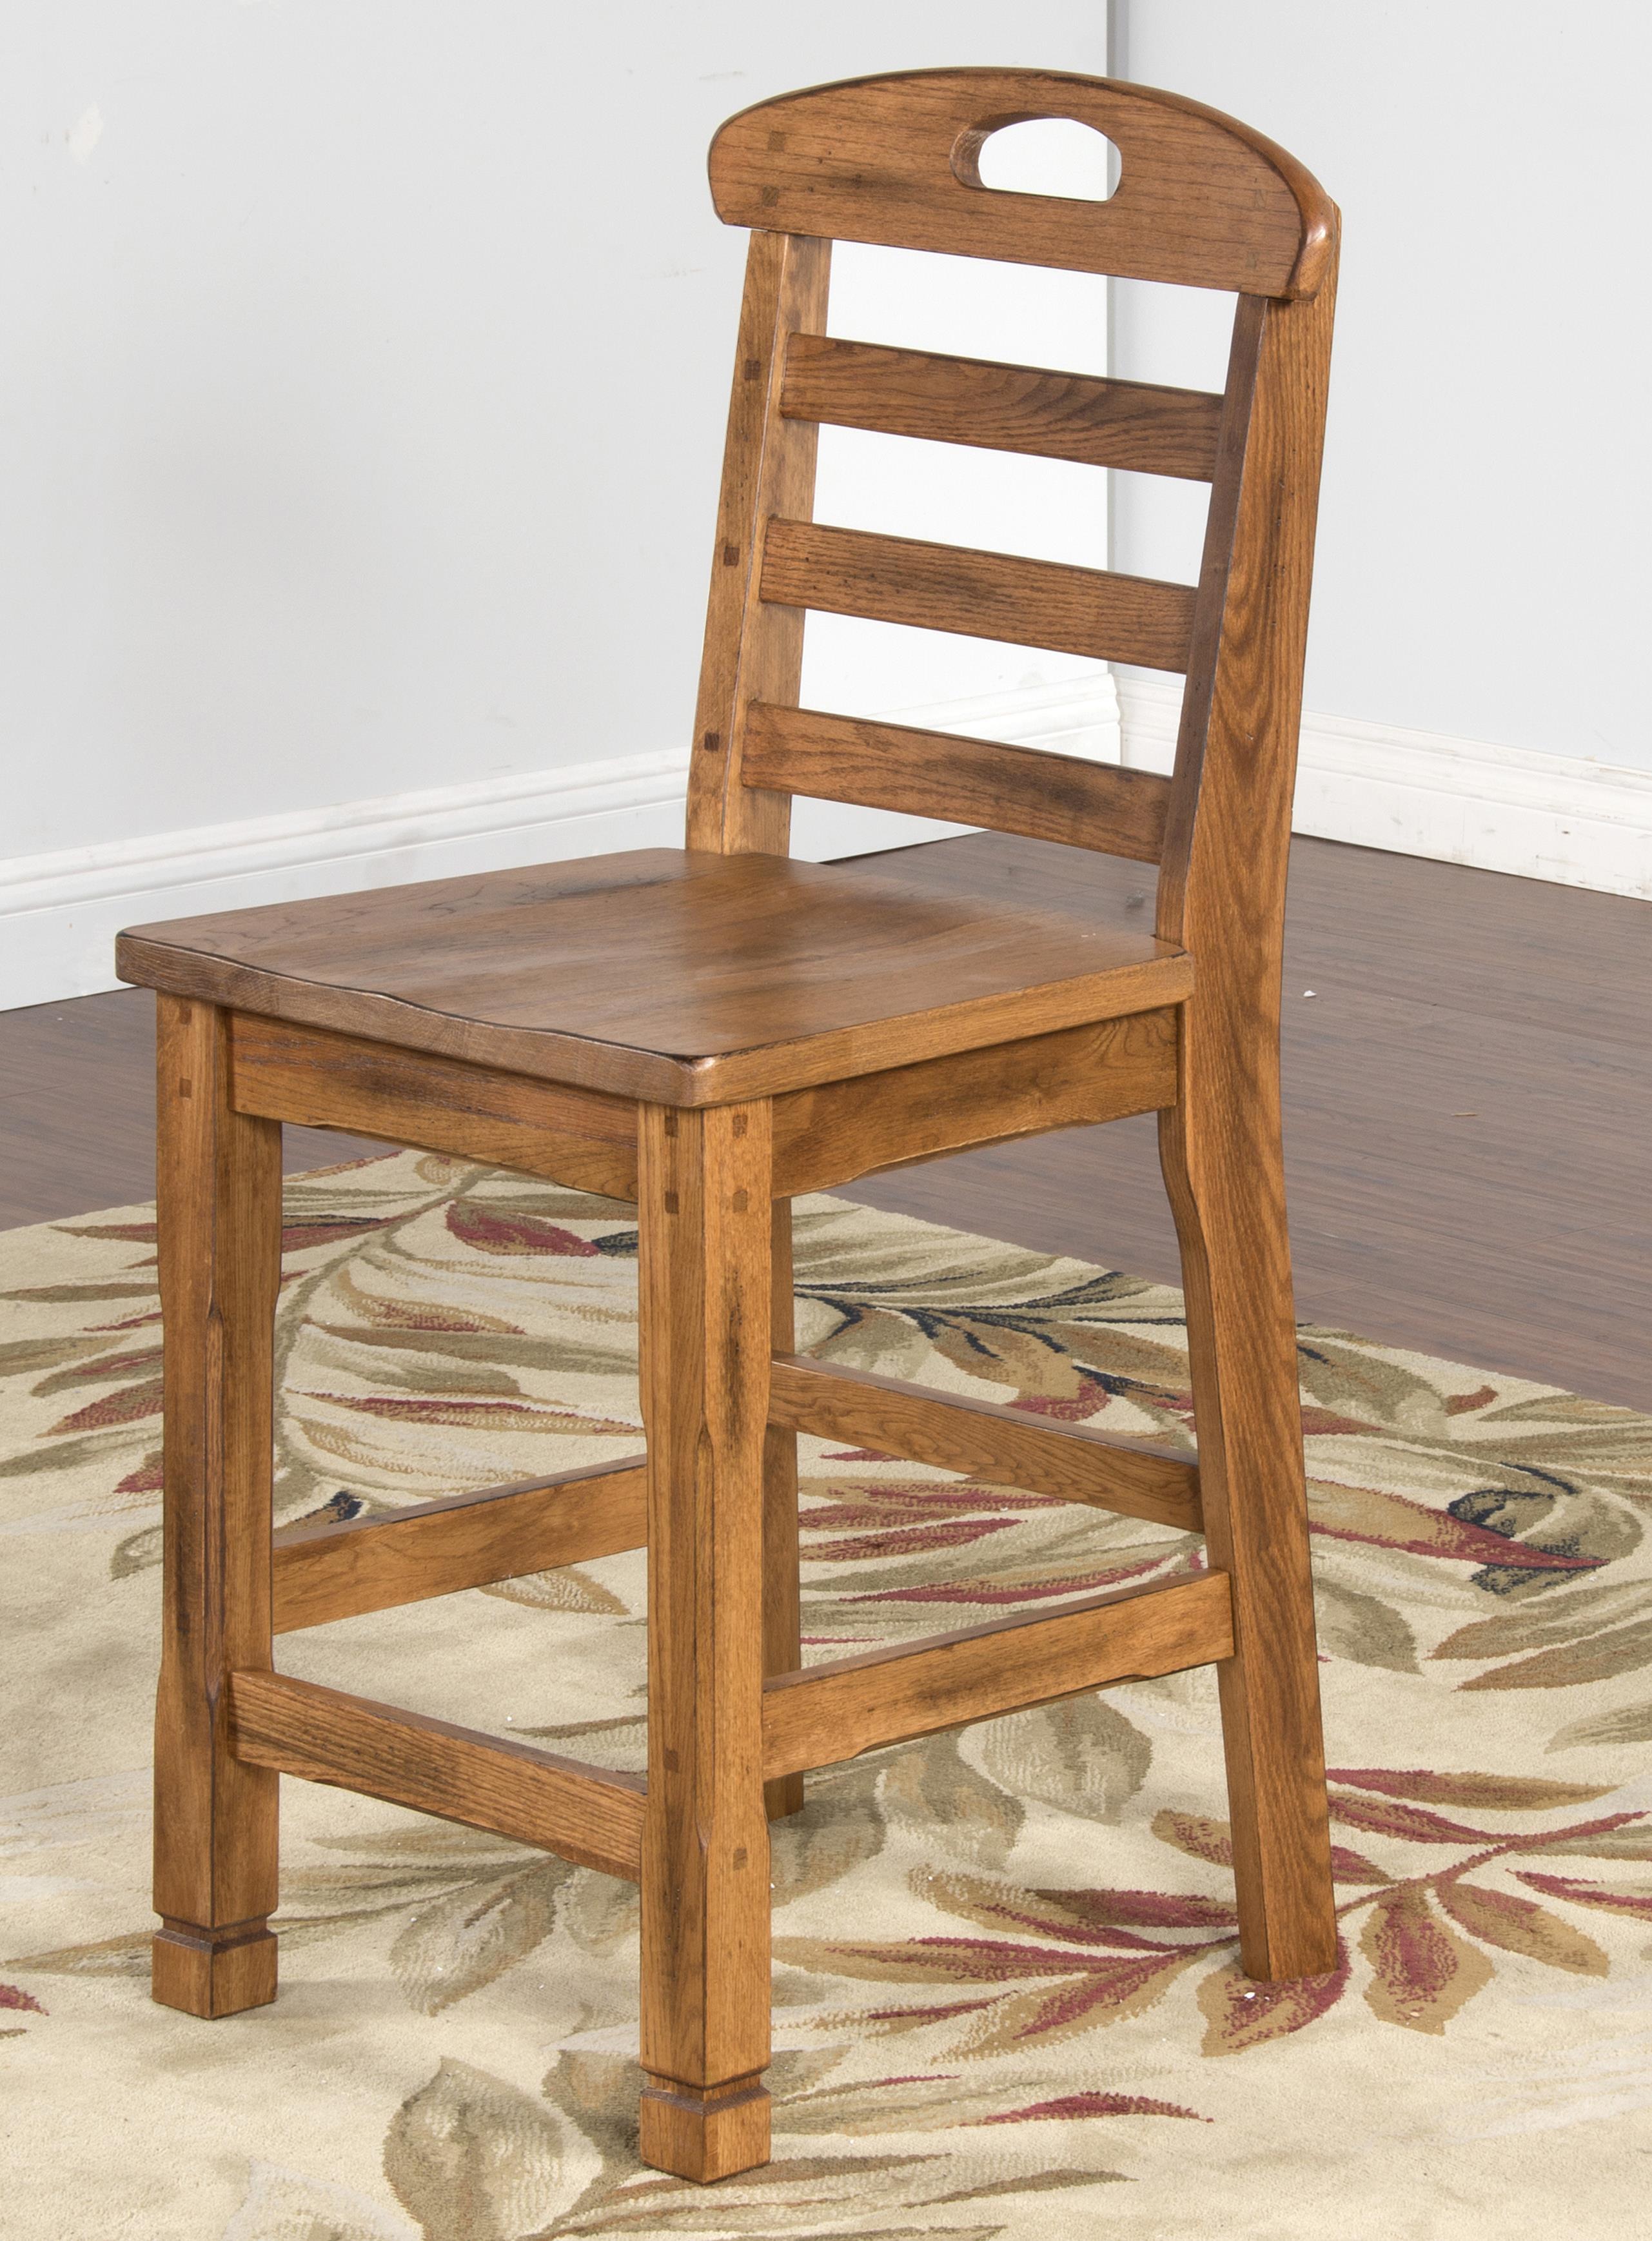 Sunny Designs Sedona Ladderback Barstool - Item Number: 1822-RO